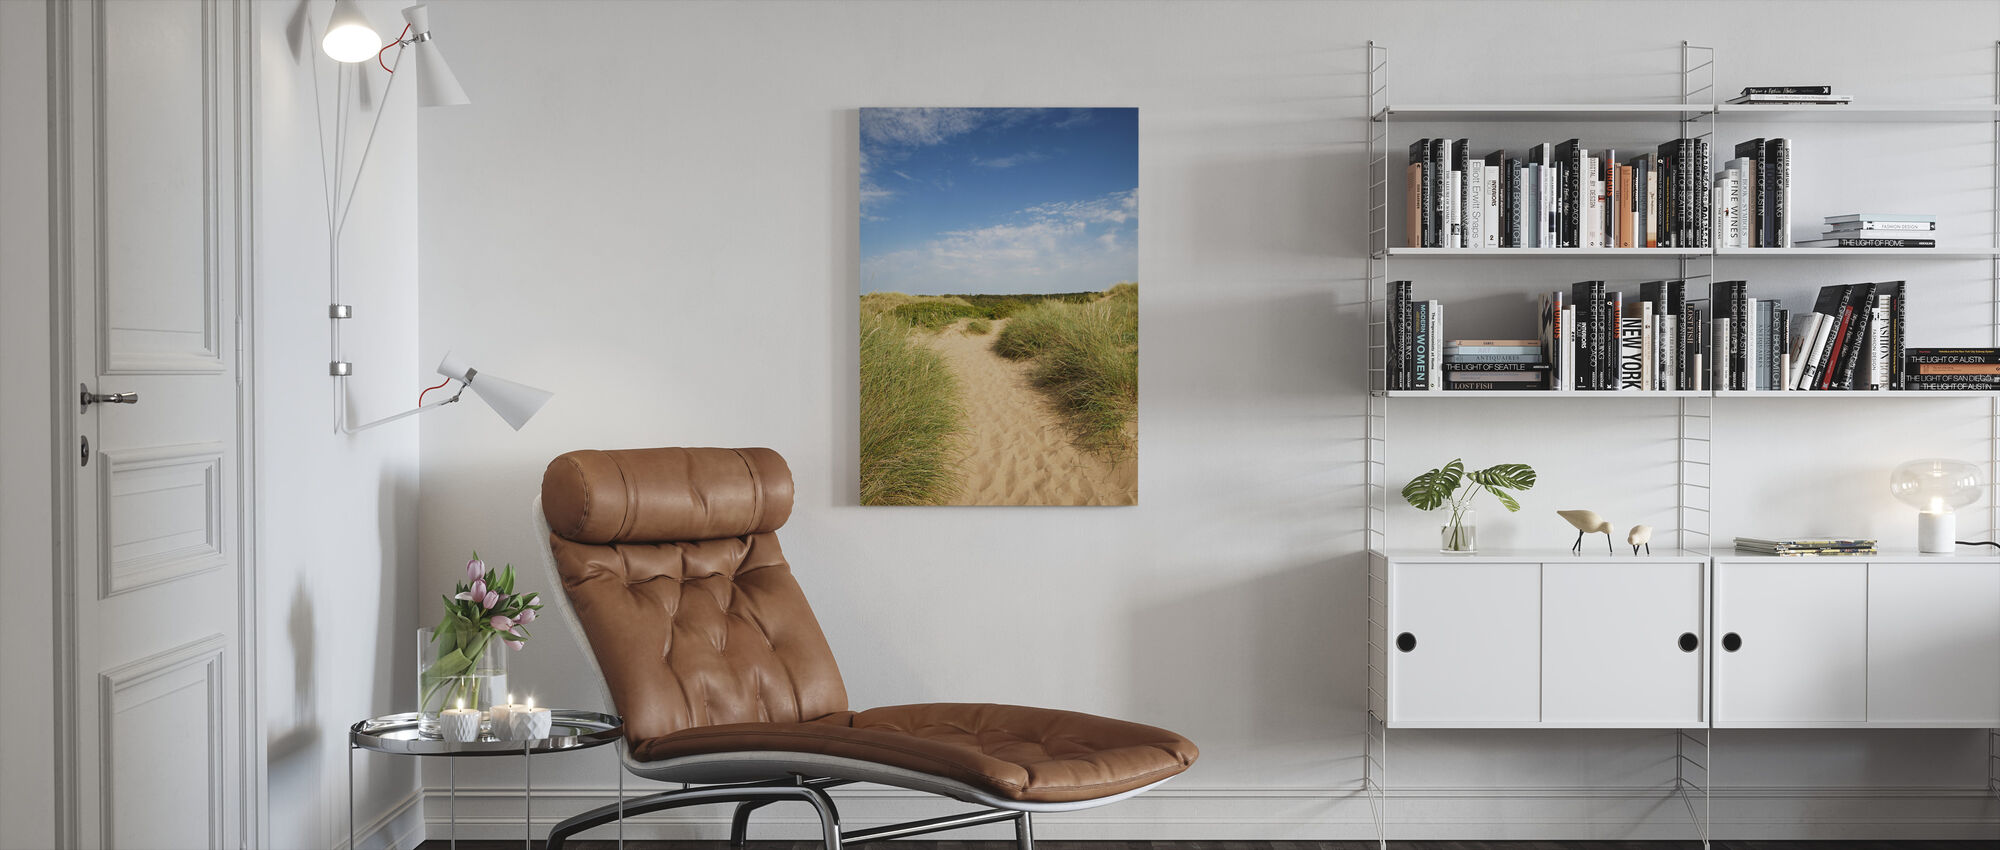 Beach in Tylösand, Sweden - Canvas print - Living Room